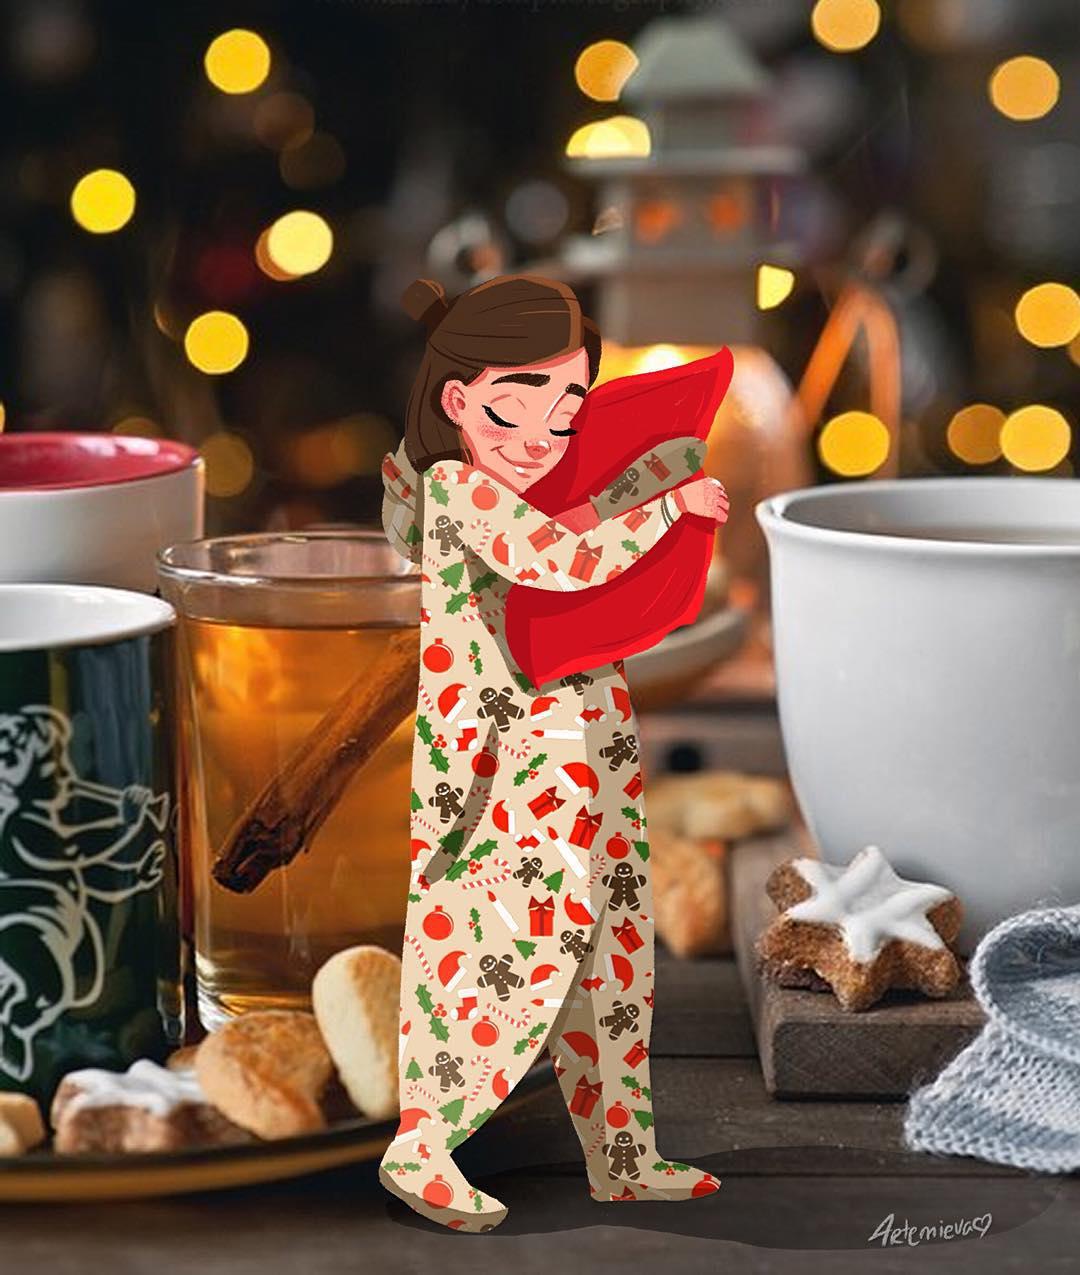 Фото Девушка в пижаме обнимает подушку, стоя на столе среди чашек, by dariart. art